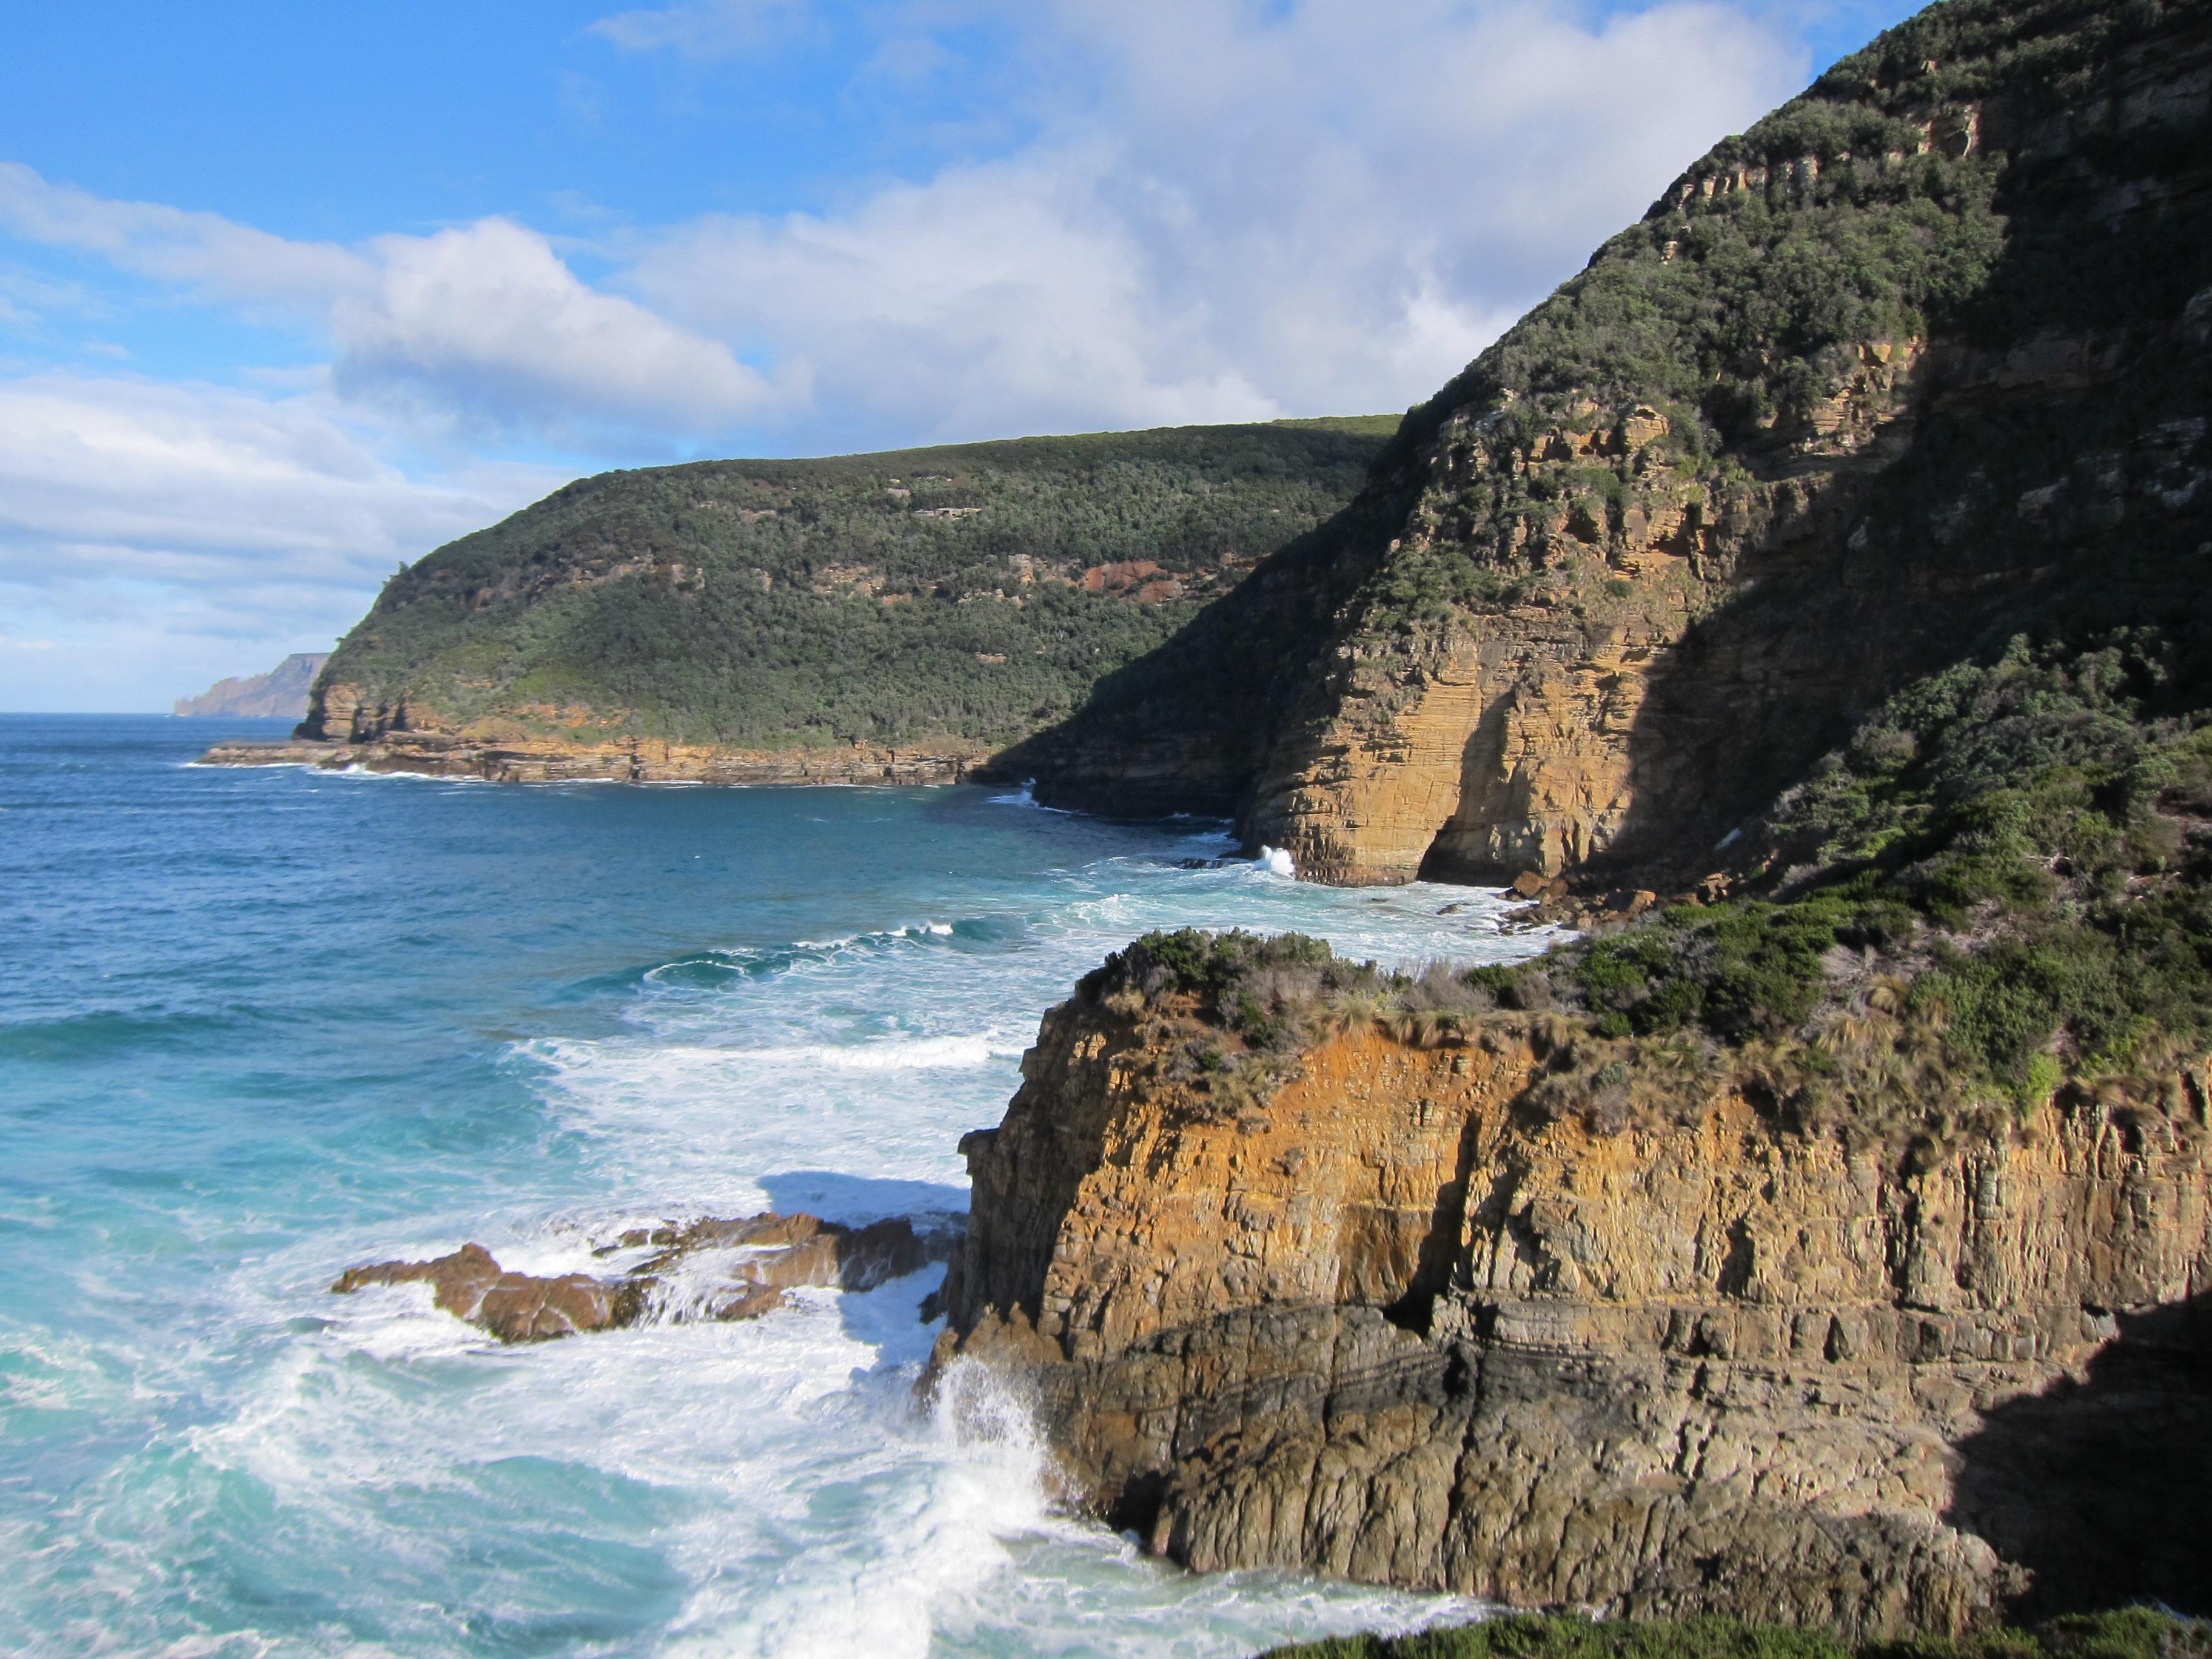 Cedric - Patissier en Australie - Tasman Peninsula